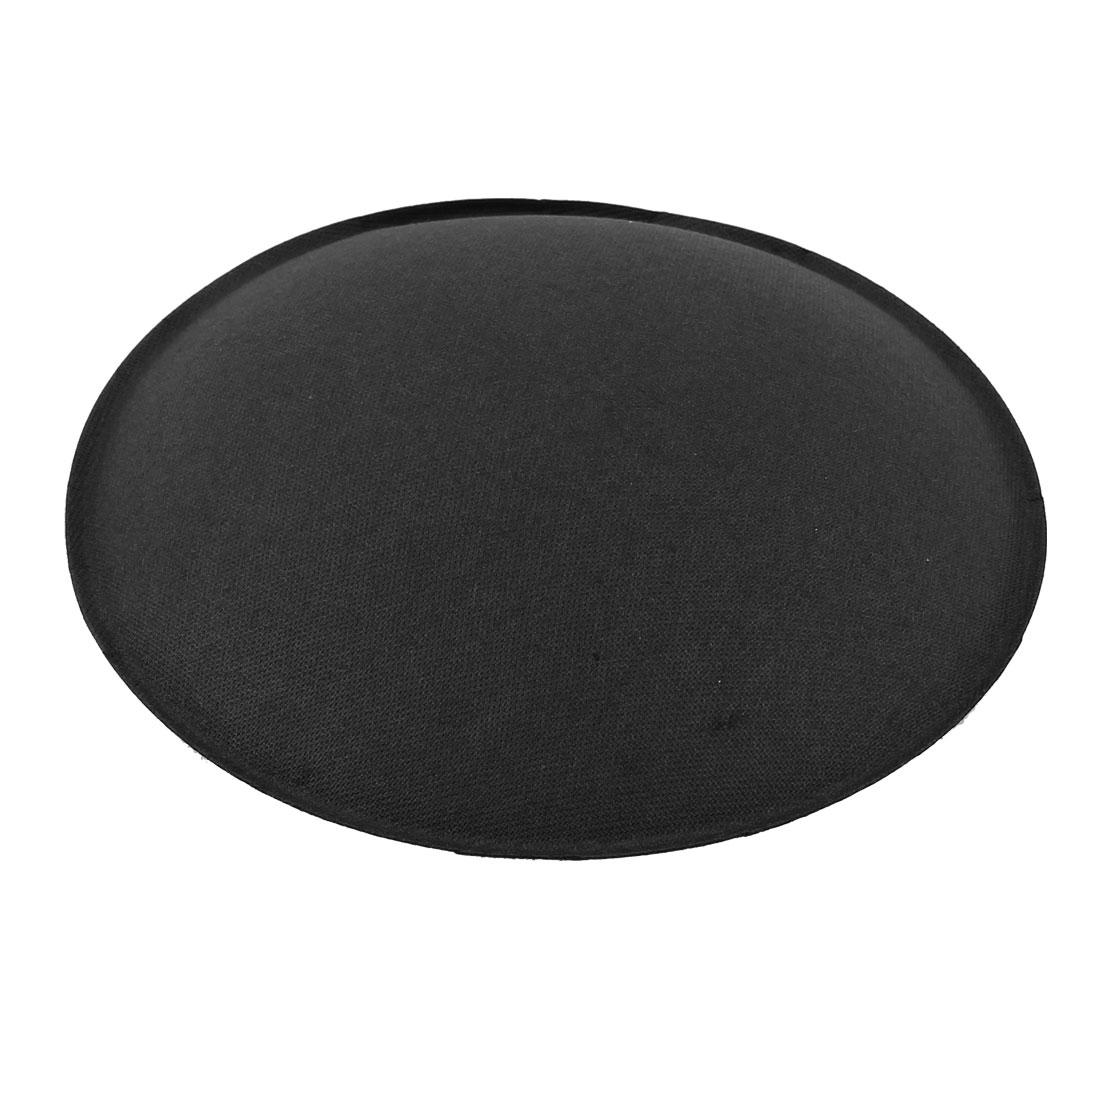 125mm Dia Dome Shape Audio Speaker Loudspeaker Subwoofer Dustproof Cover Cap